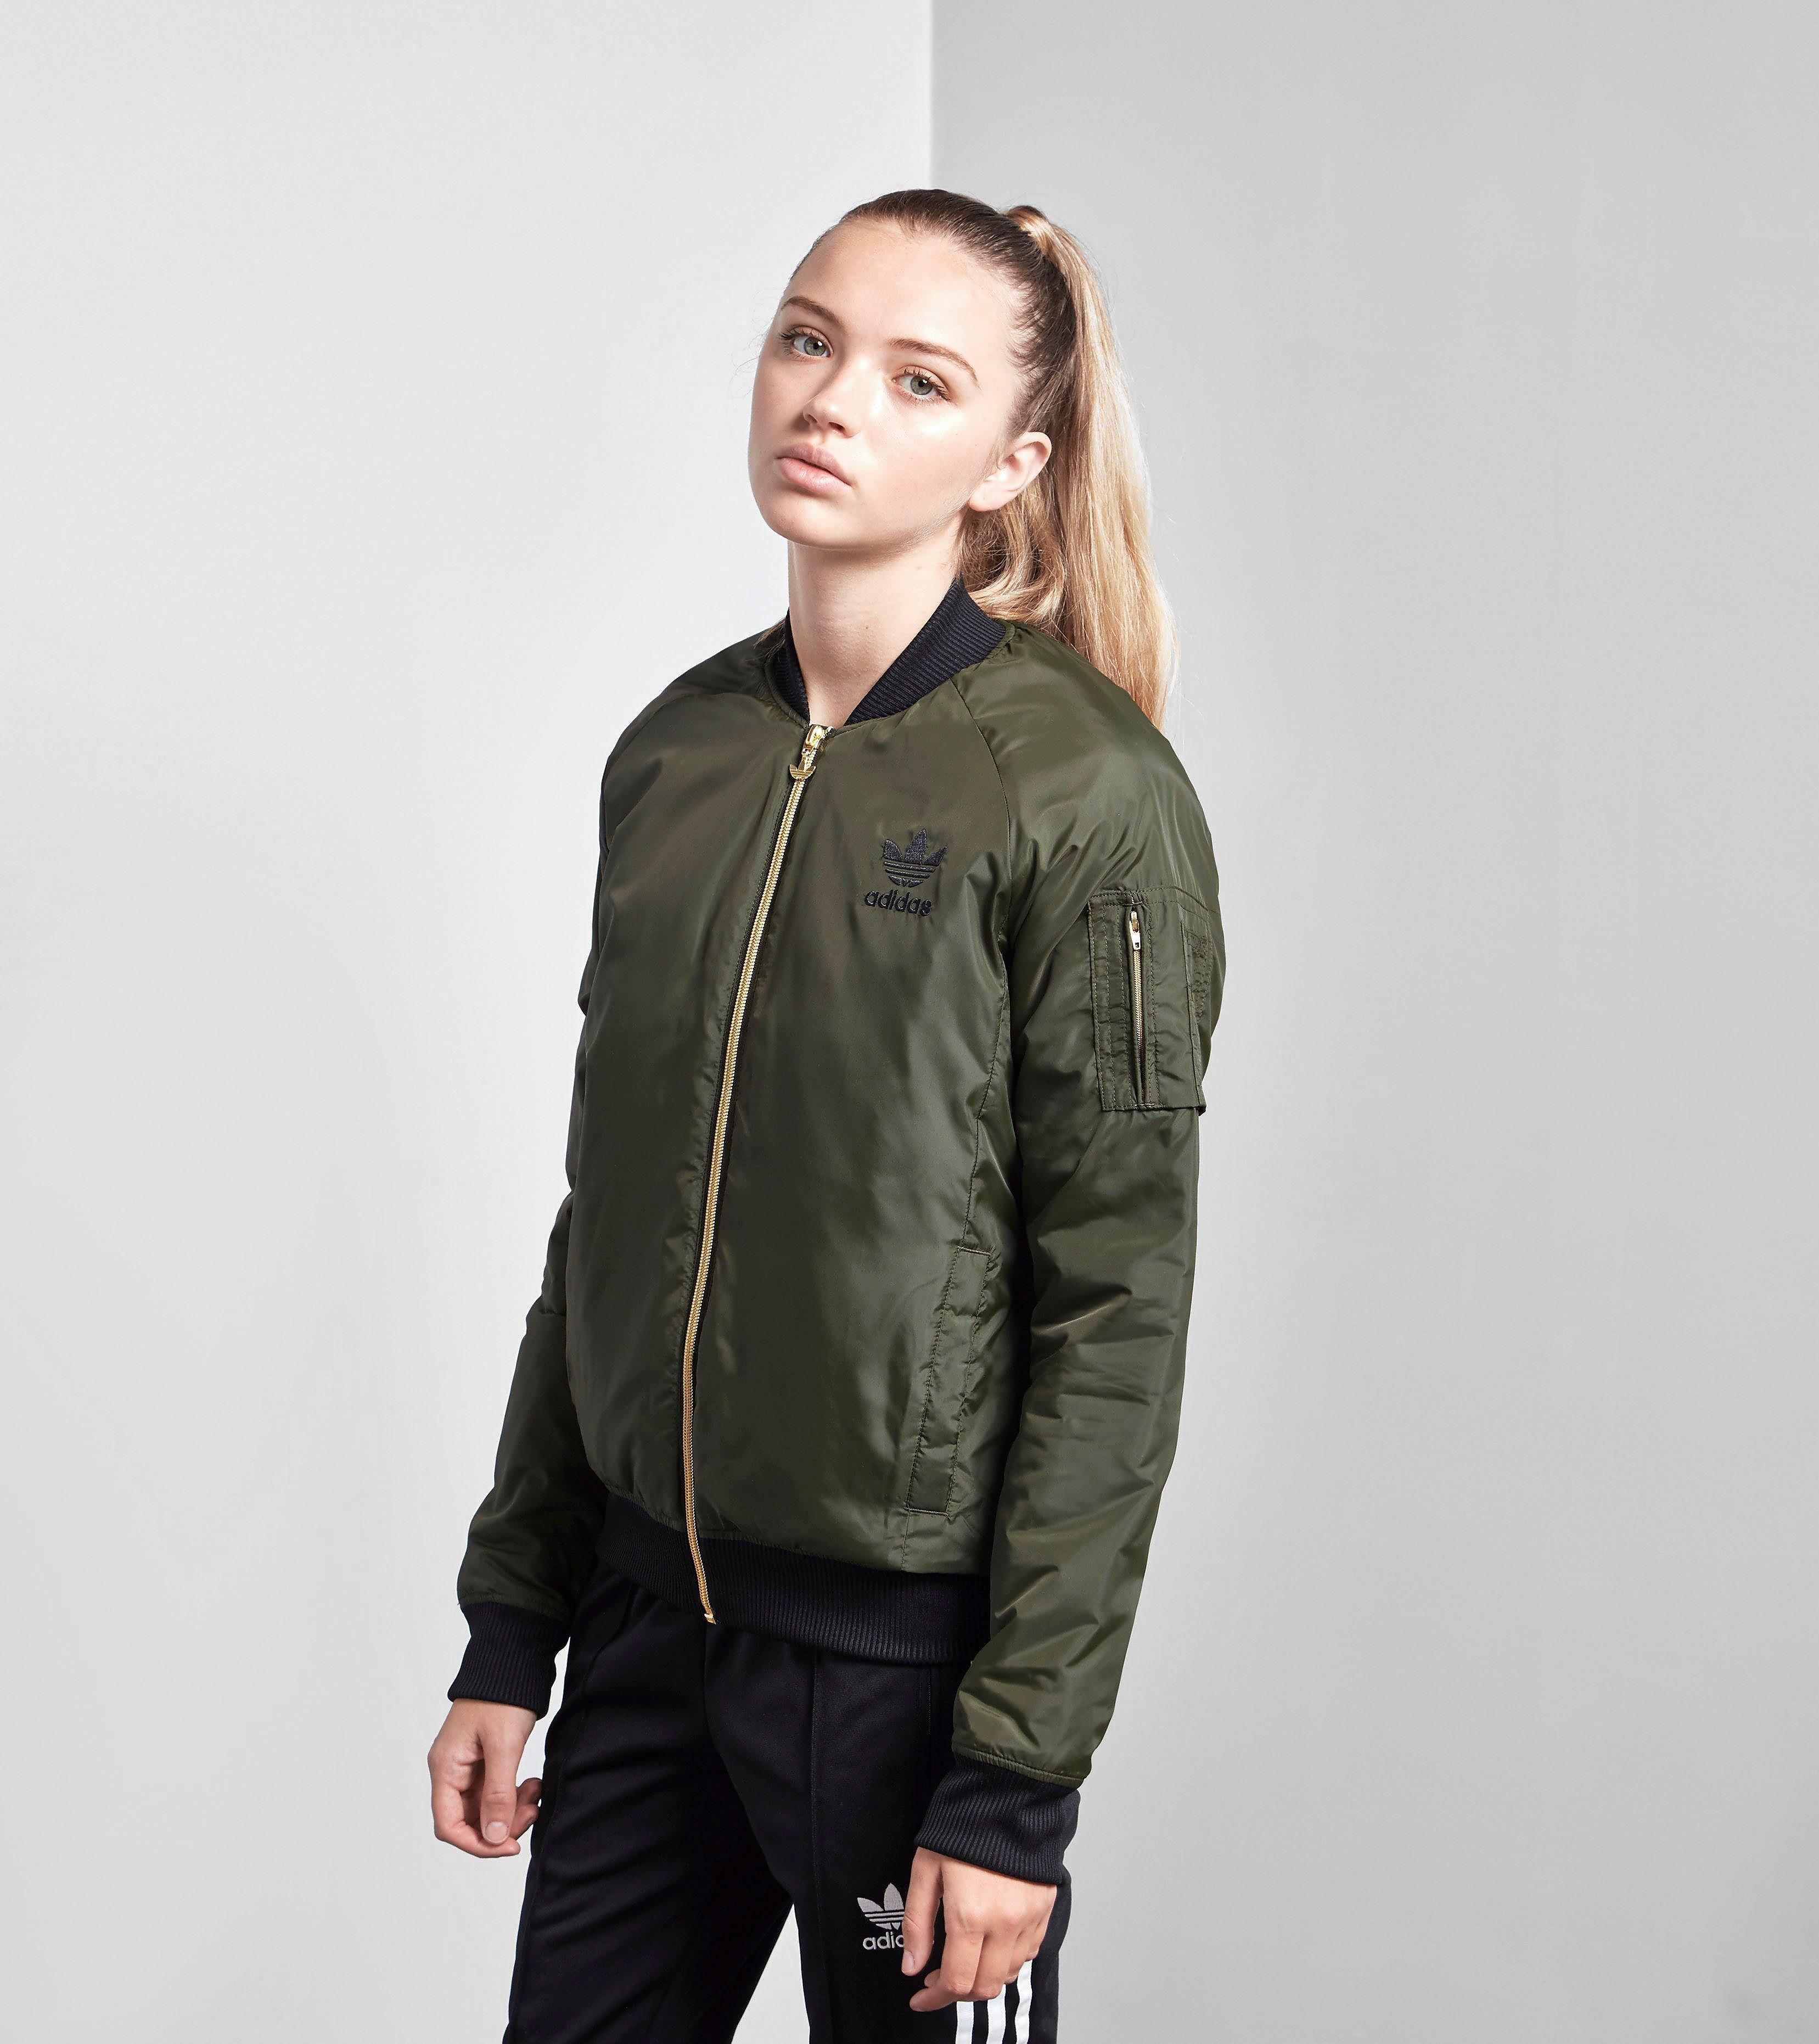 adidas Originals MA1 Bomber Jacket